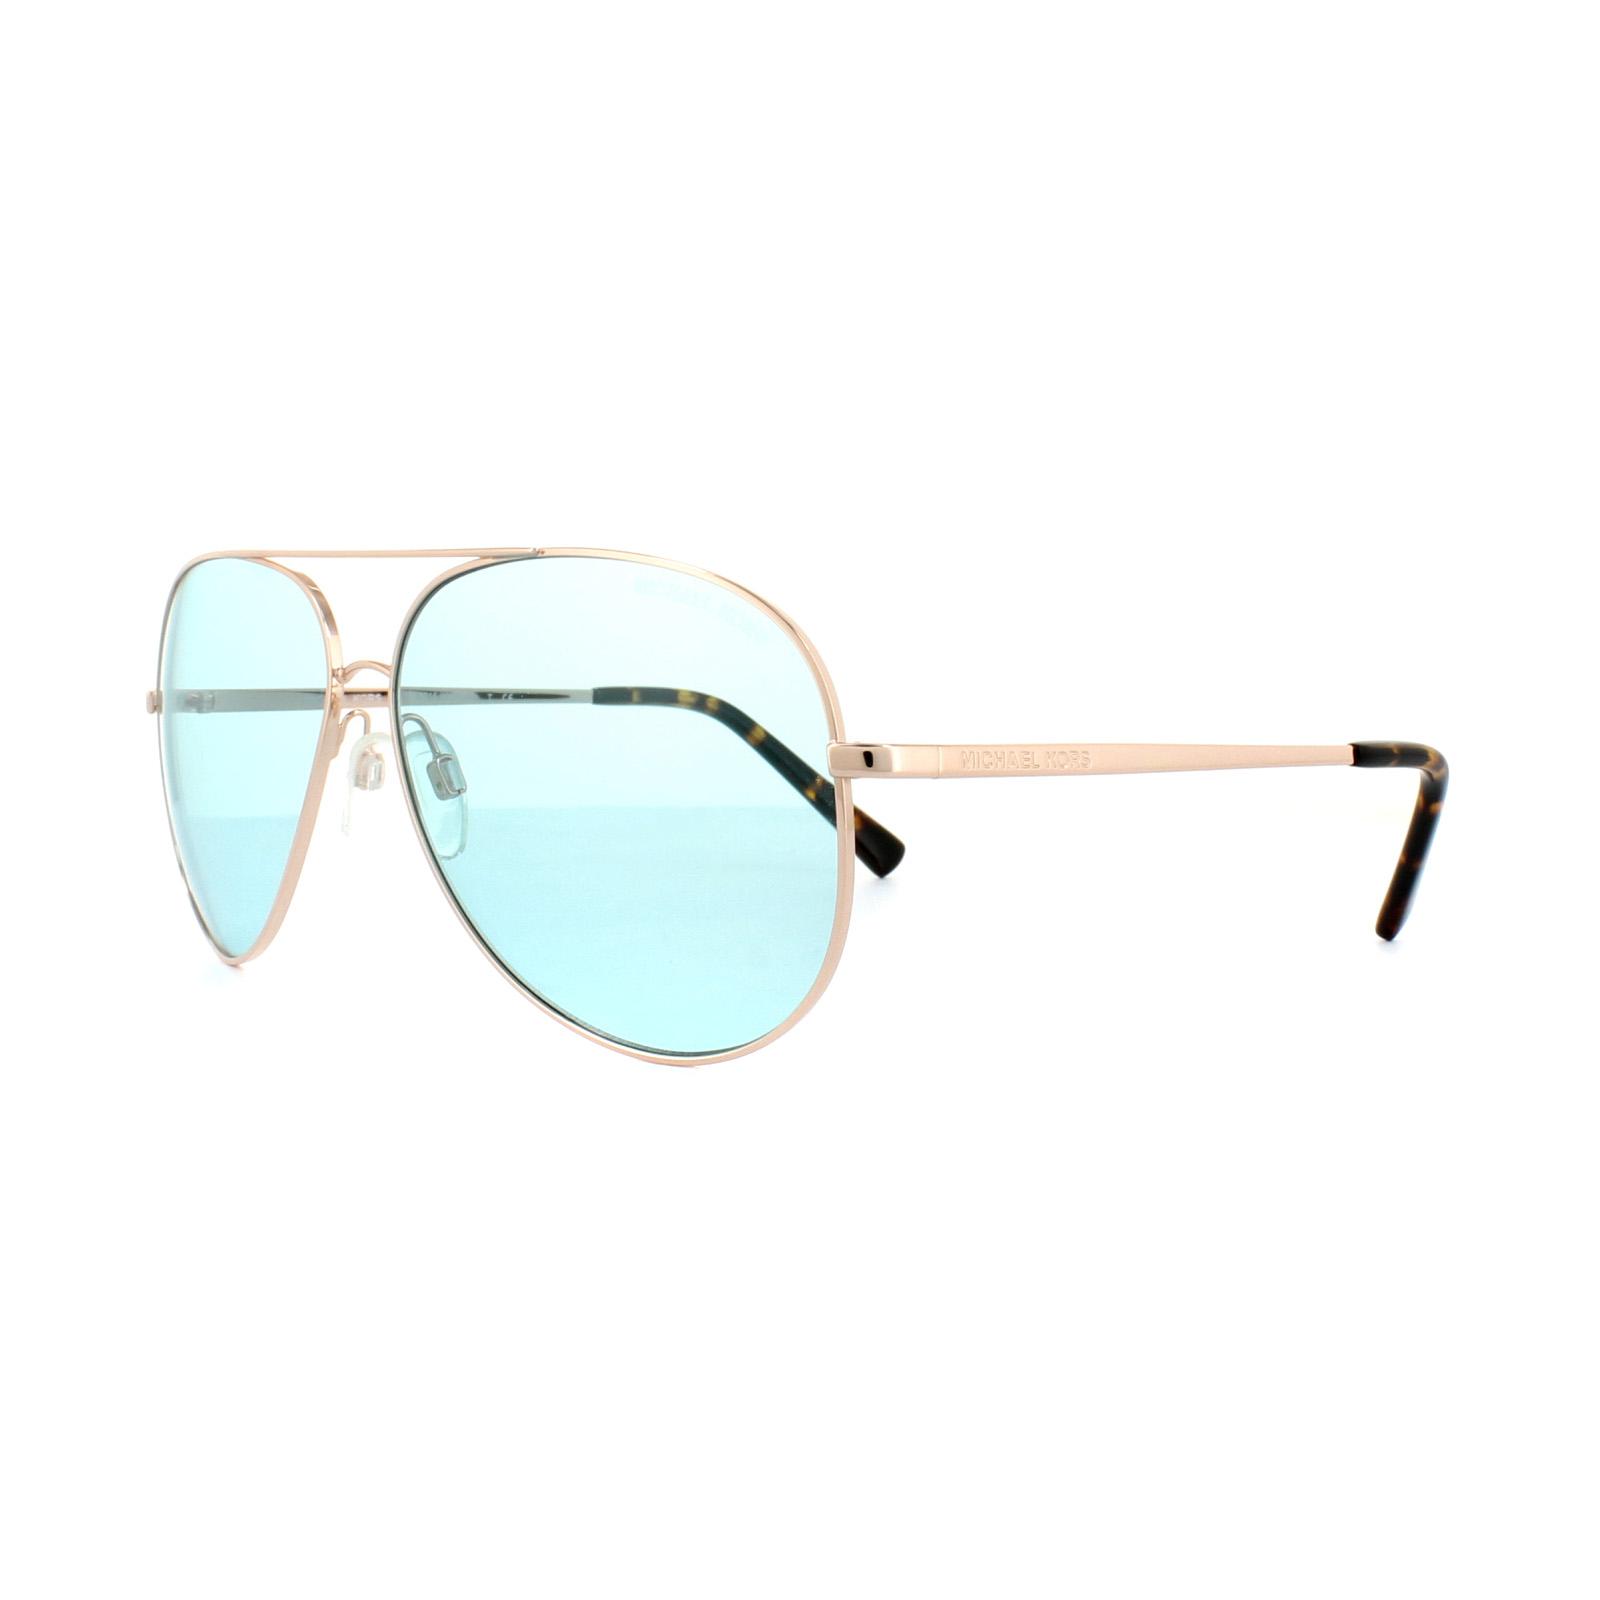 8a4da2cb9e4f4 Cheap Michael Kors Kendall 1 5016 Sunglasses - Discounted Sunglasses